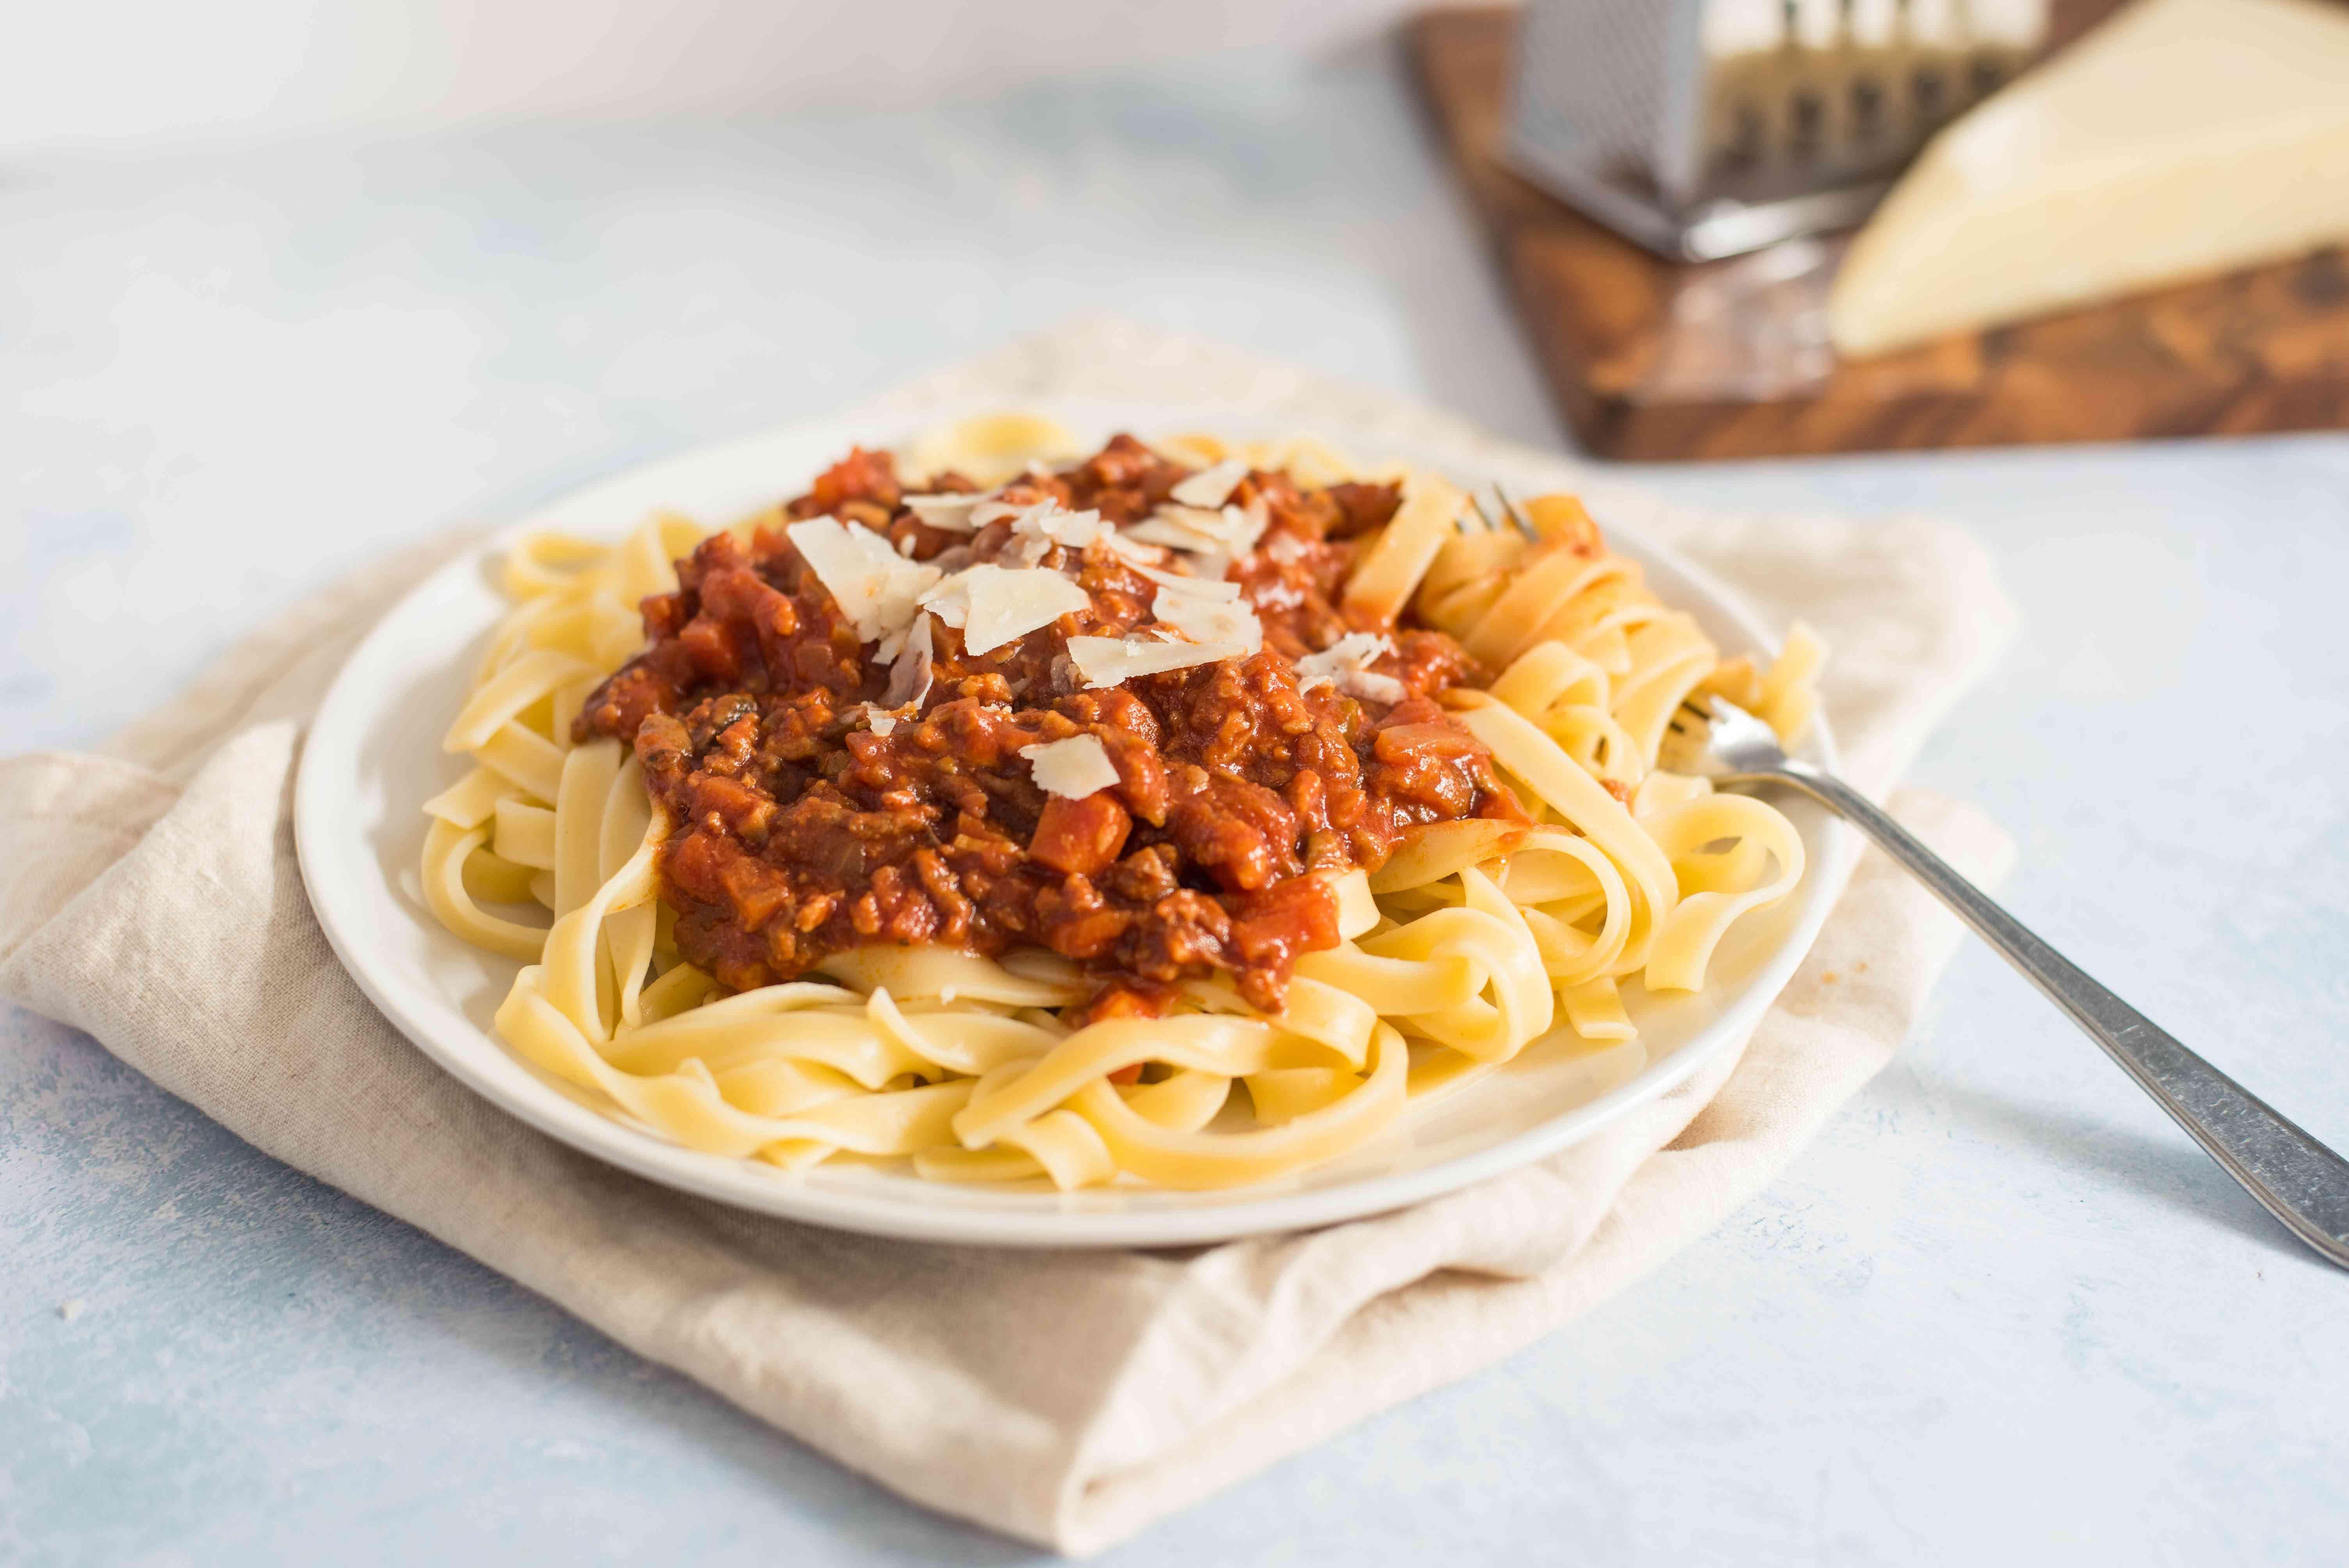 Tuscan style ragu meat sauce recipe